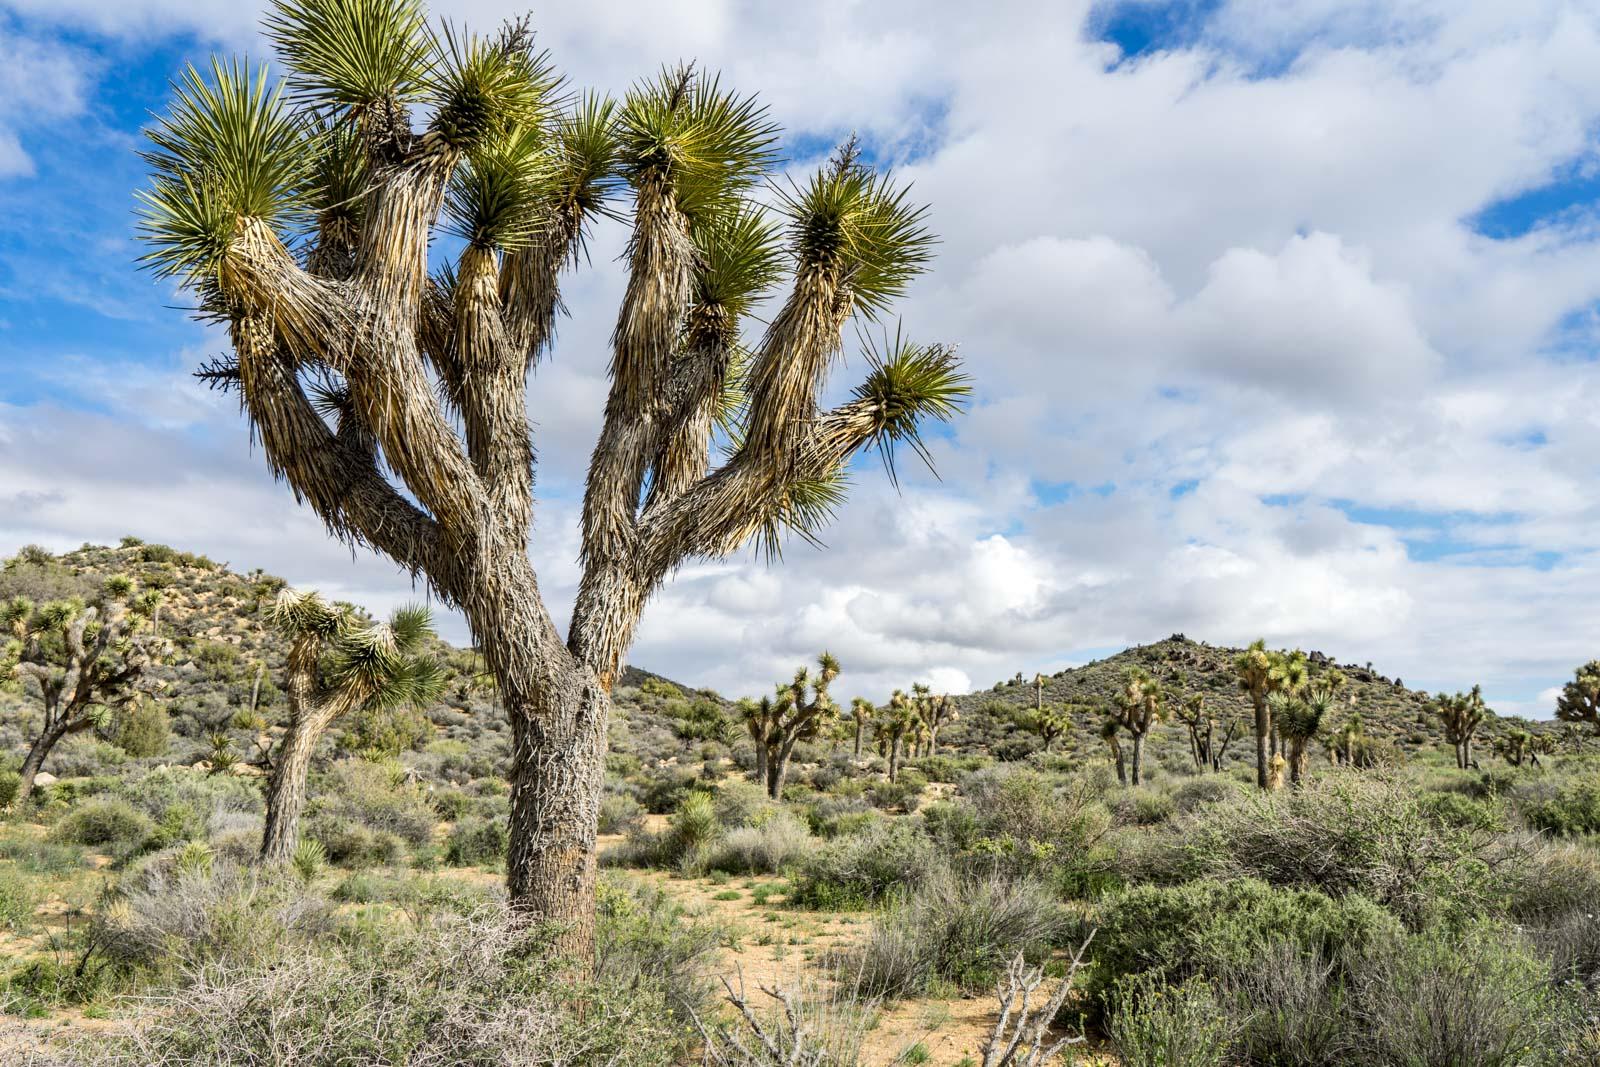 Lost Horse Mine hike, Joshua Tree National Park, California, USA